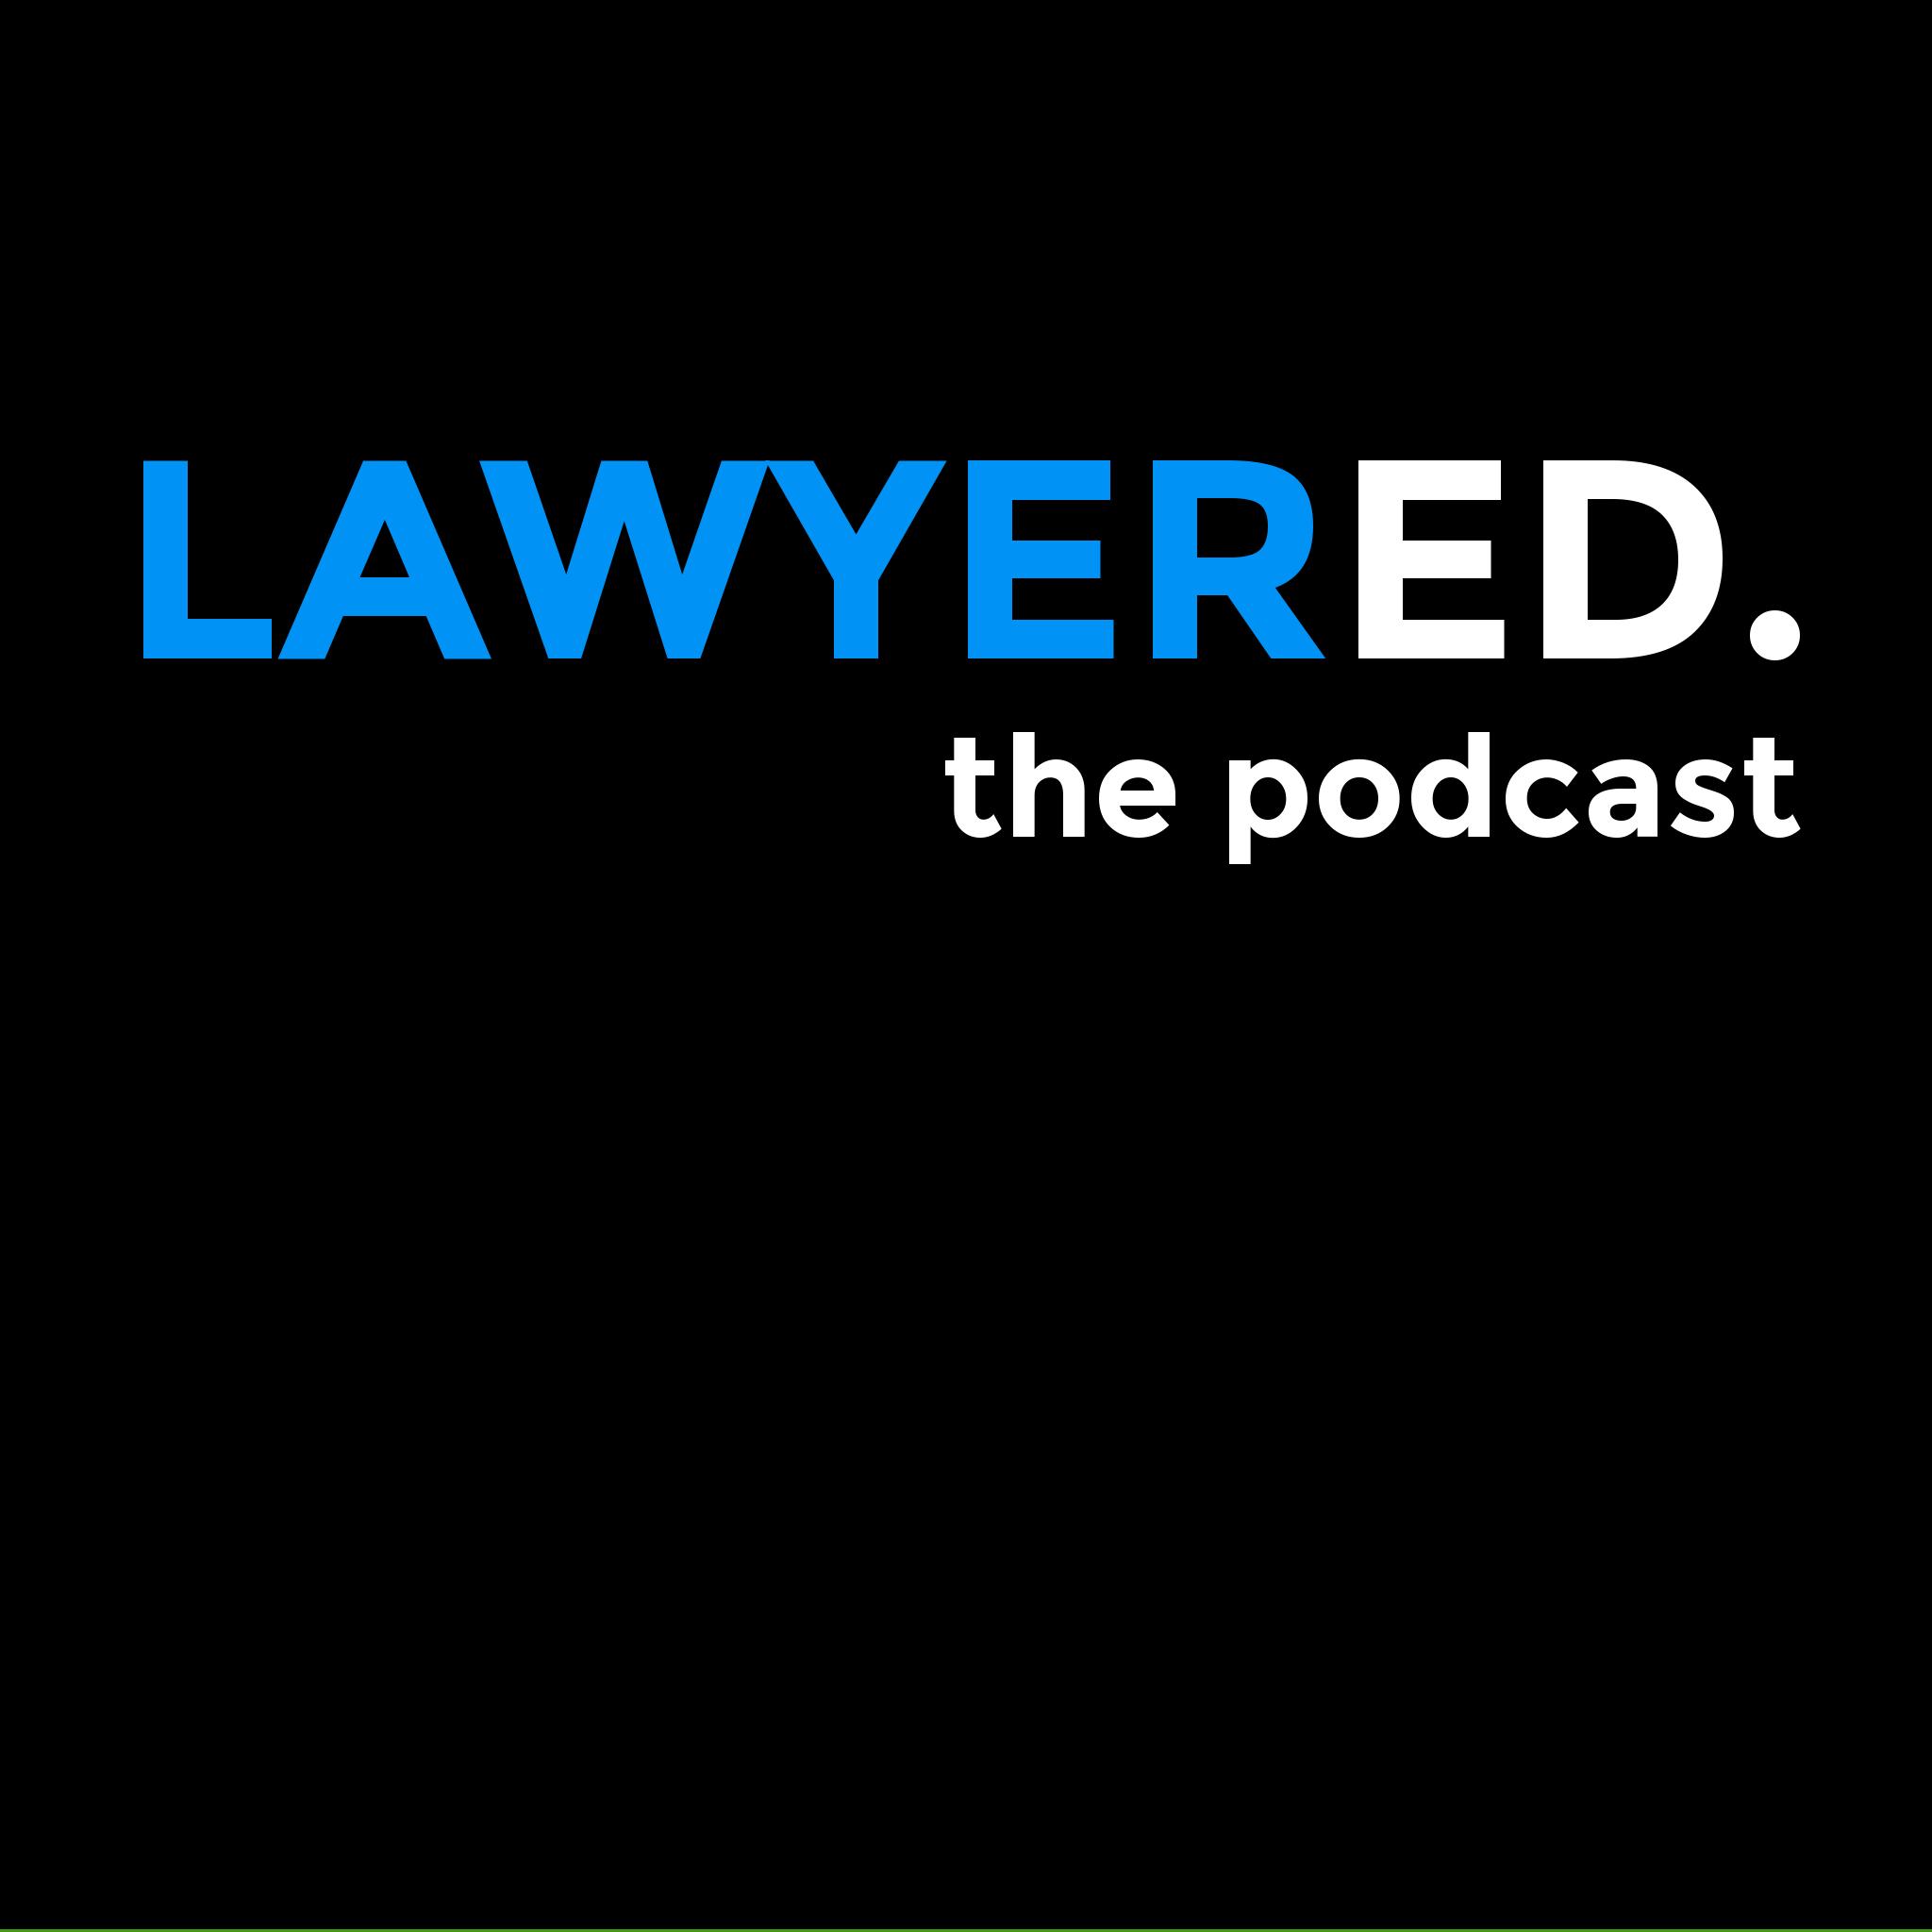 Lawyered show art